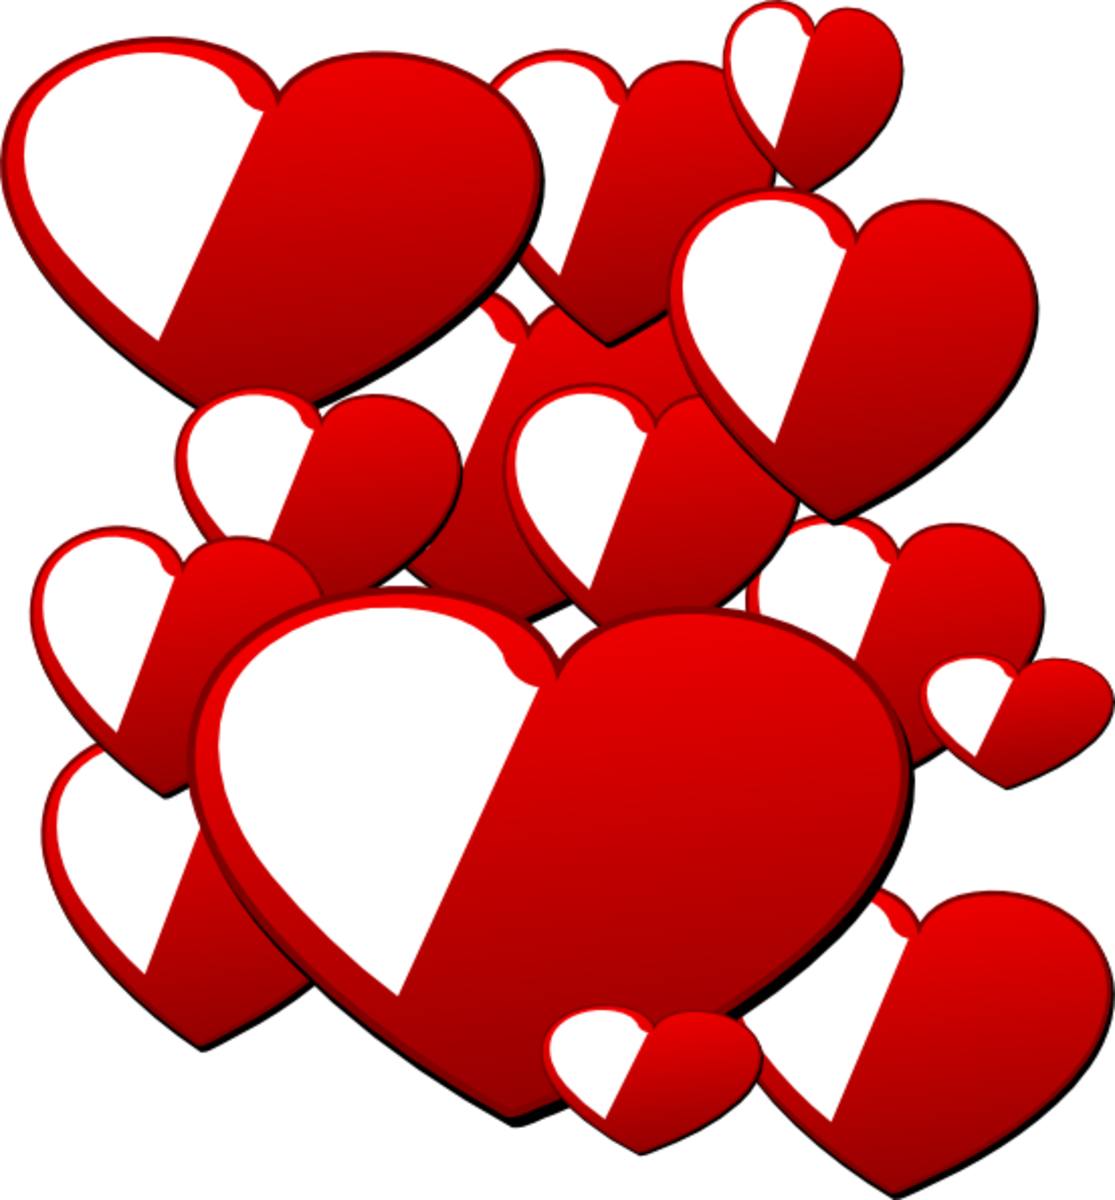 Hearts Pop Art